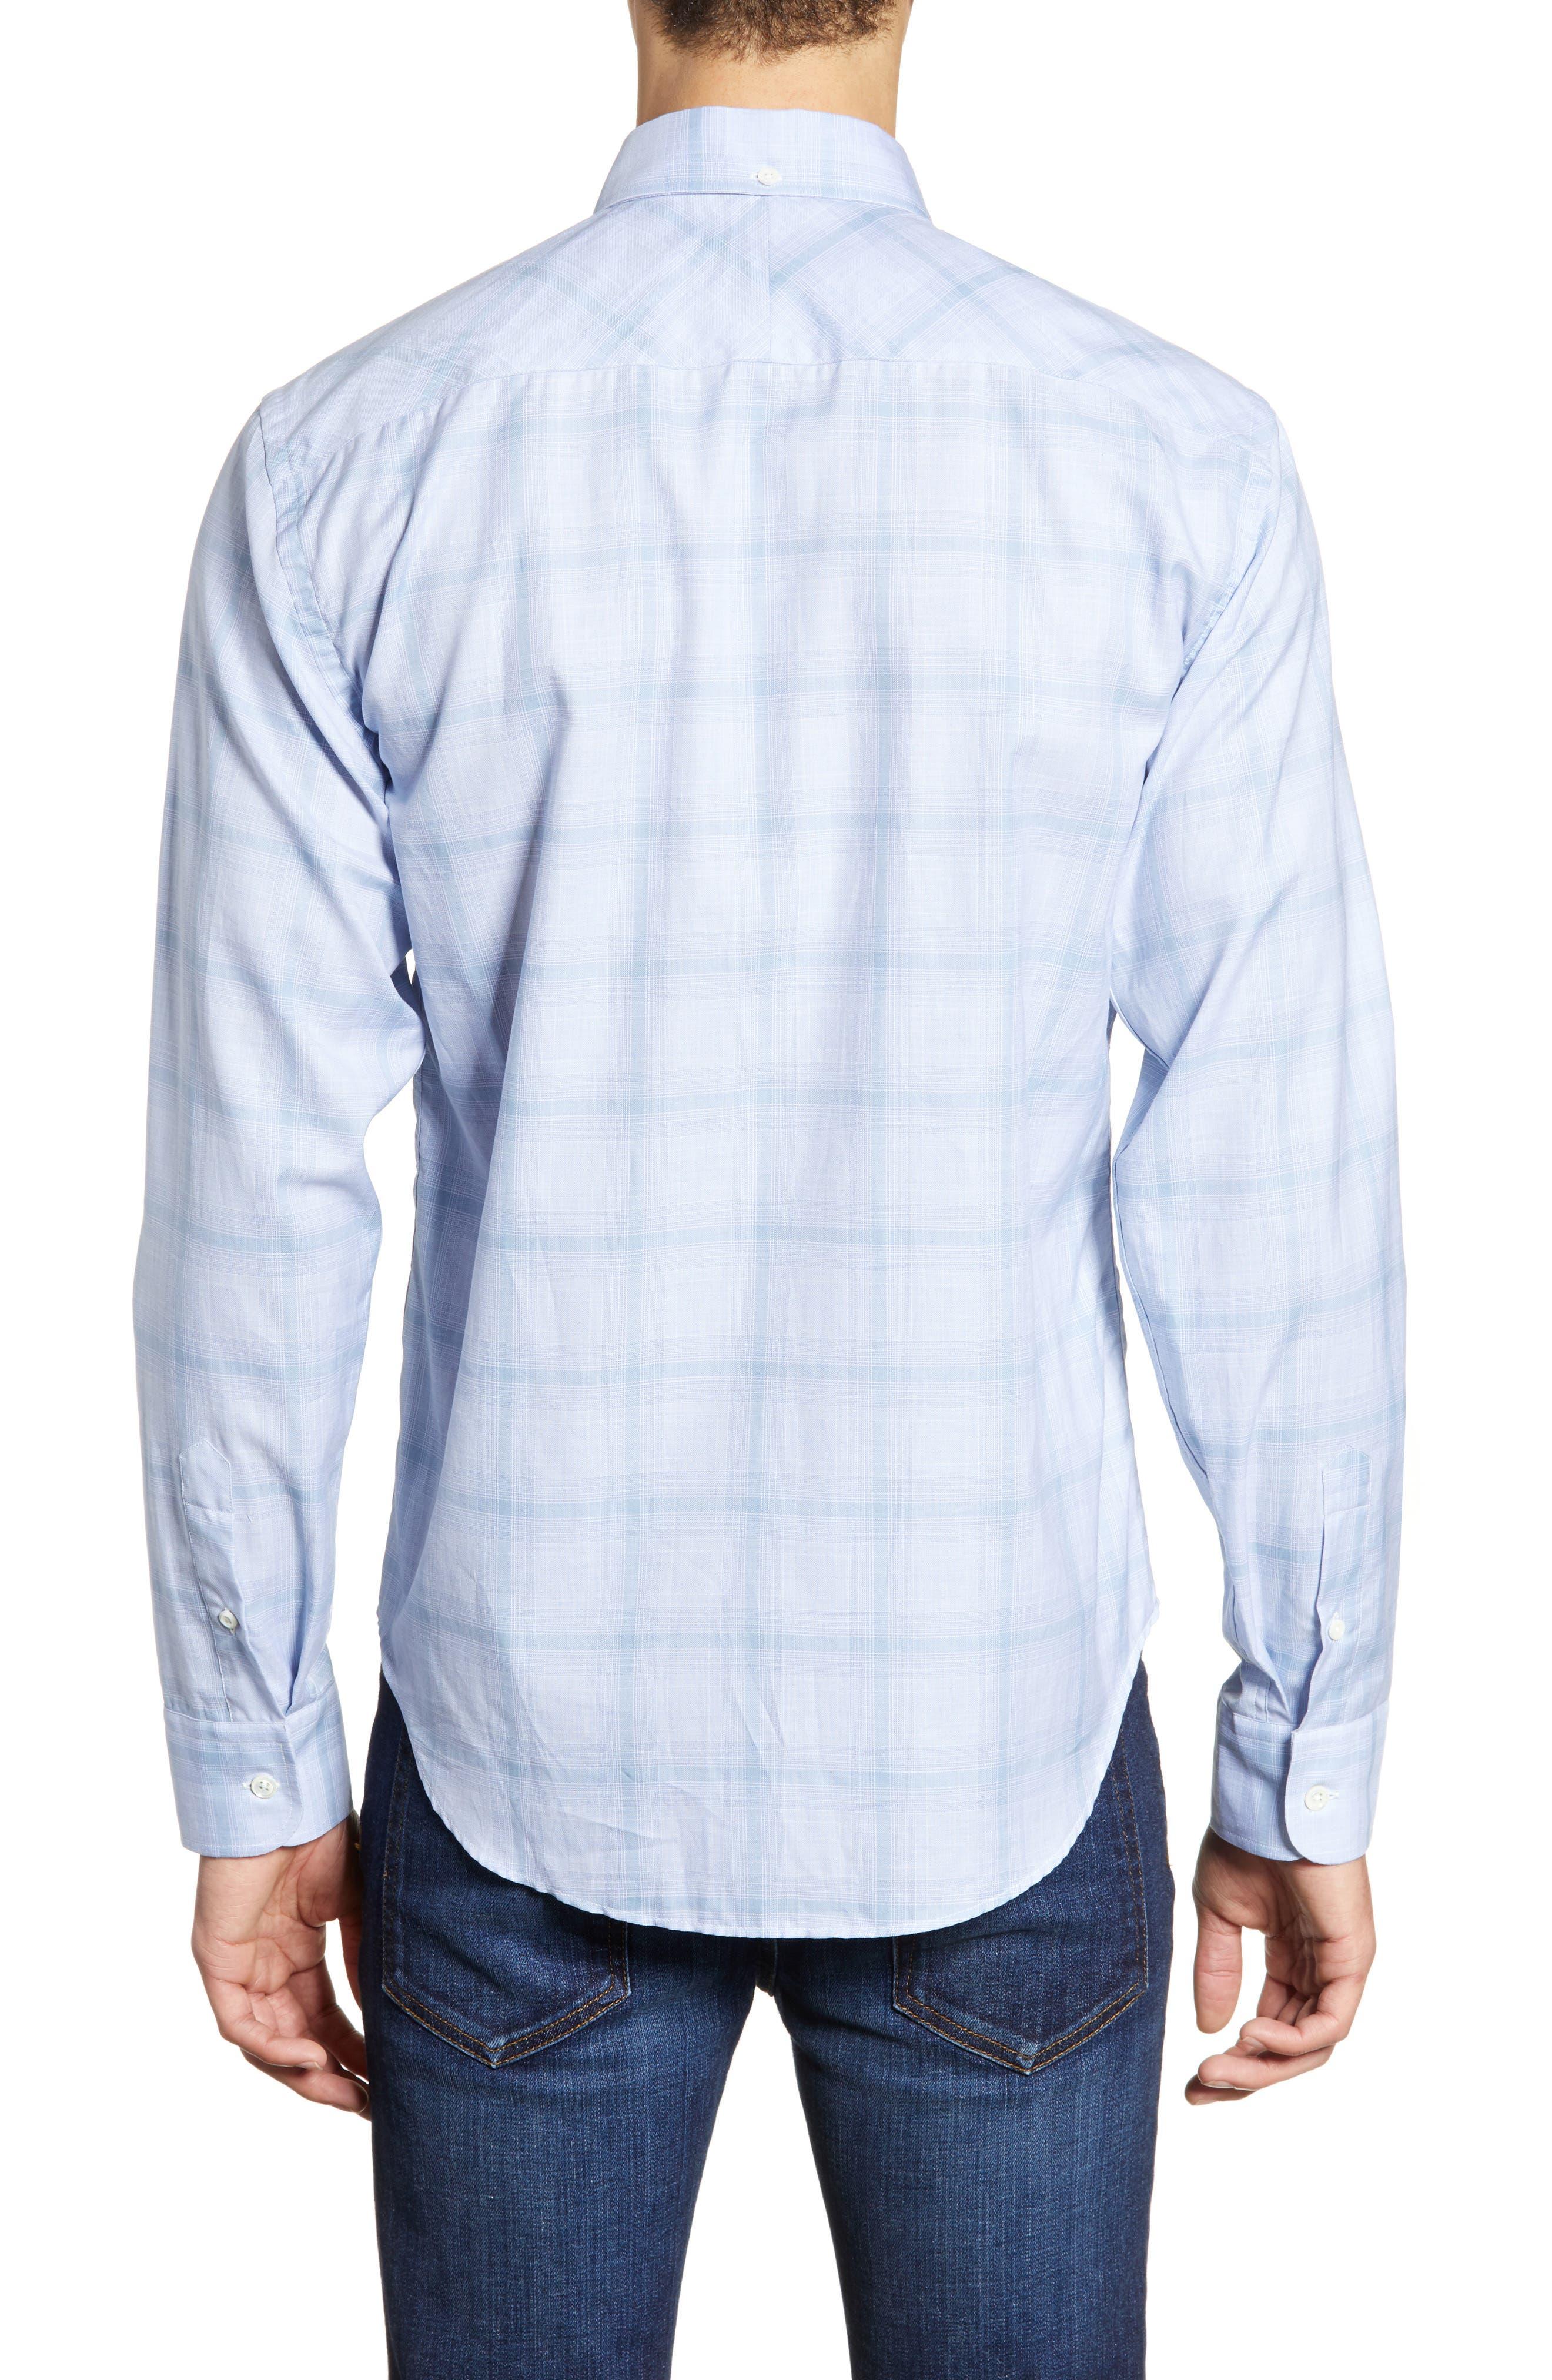 BILLY REID, Kirby Slim Fit Sport Shirt, Alternate thumbnail 3, color, BLUE